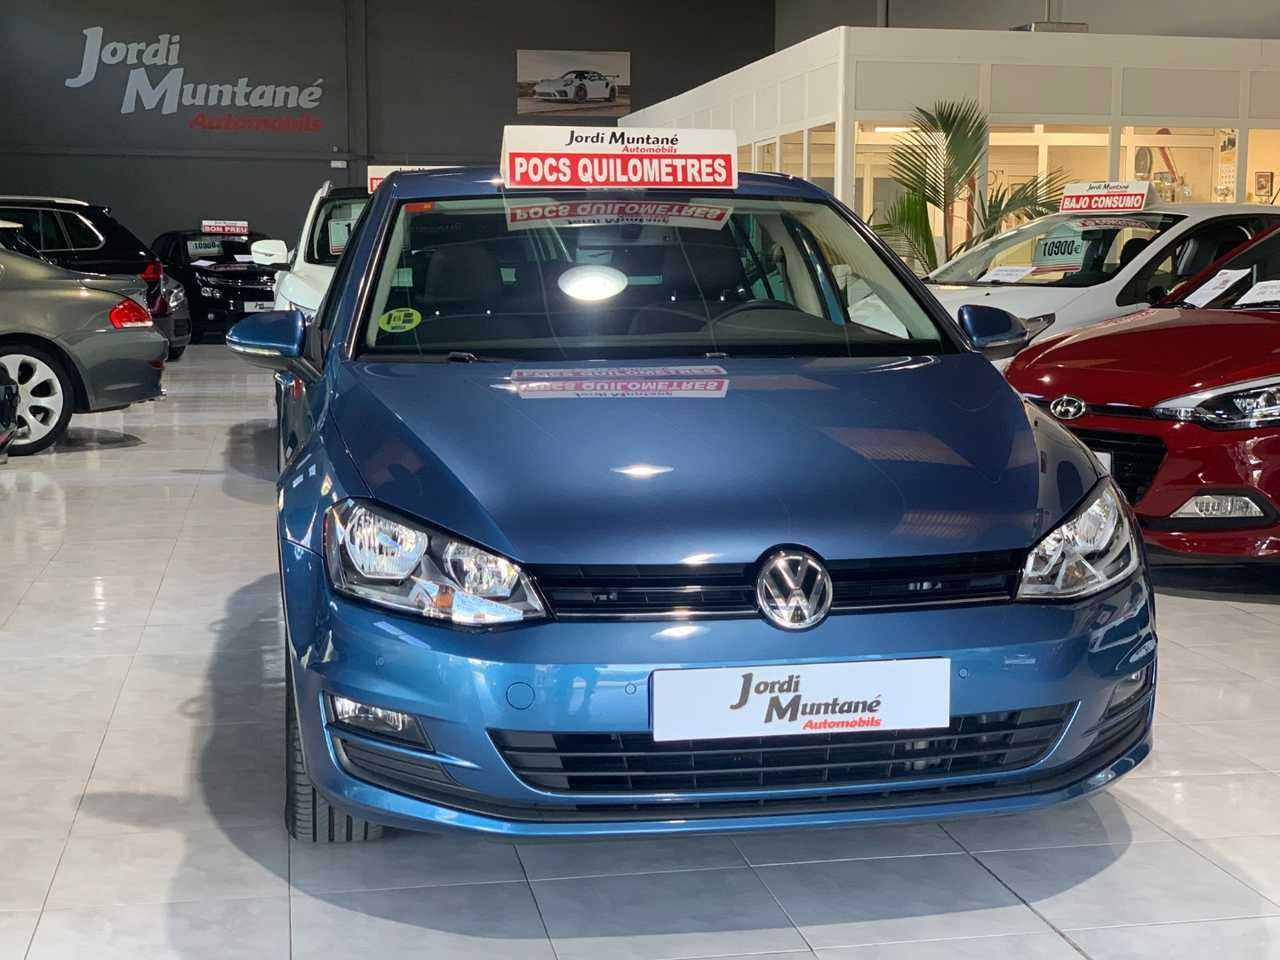 Volkswagen Golf VII 1.6 TDI 105CV .- '' MUY CUIDADO '' -.